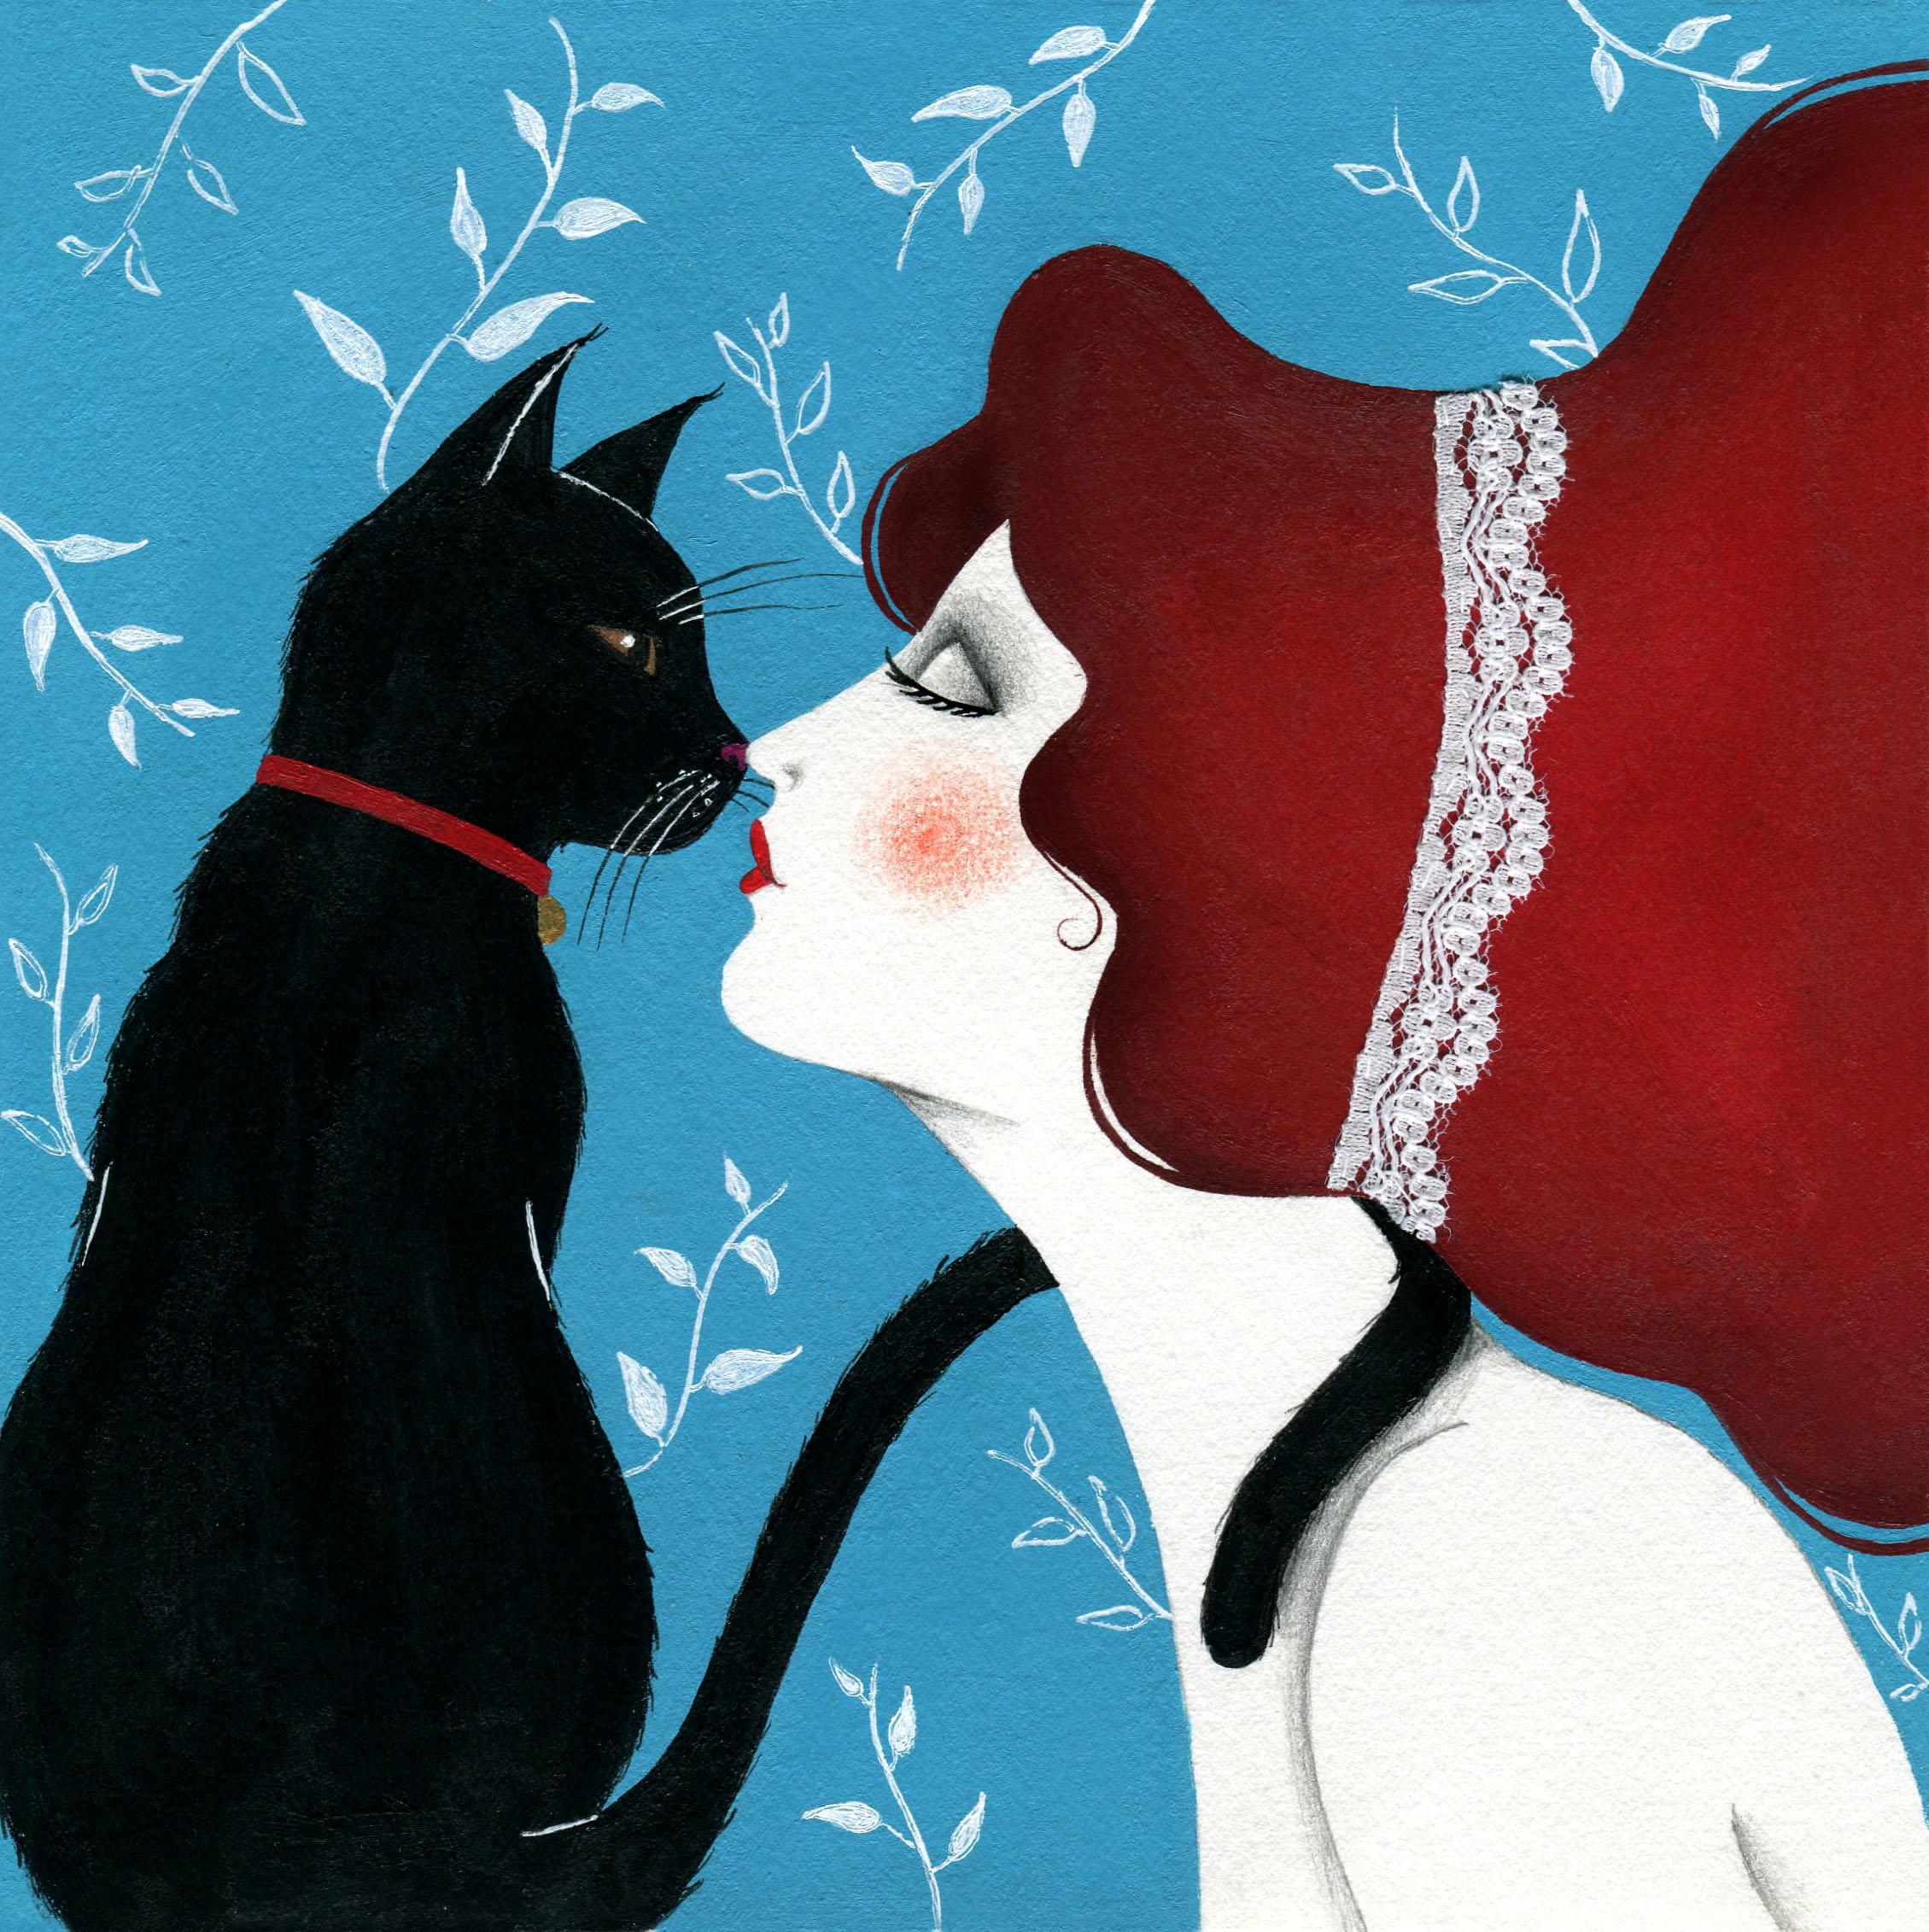 beso de gato.jpg